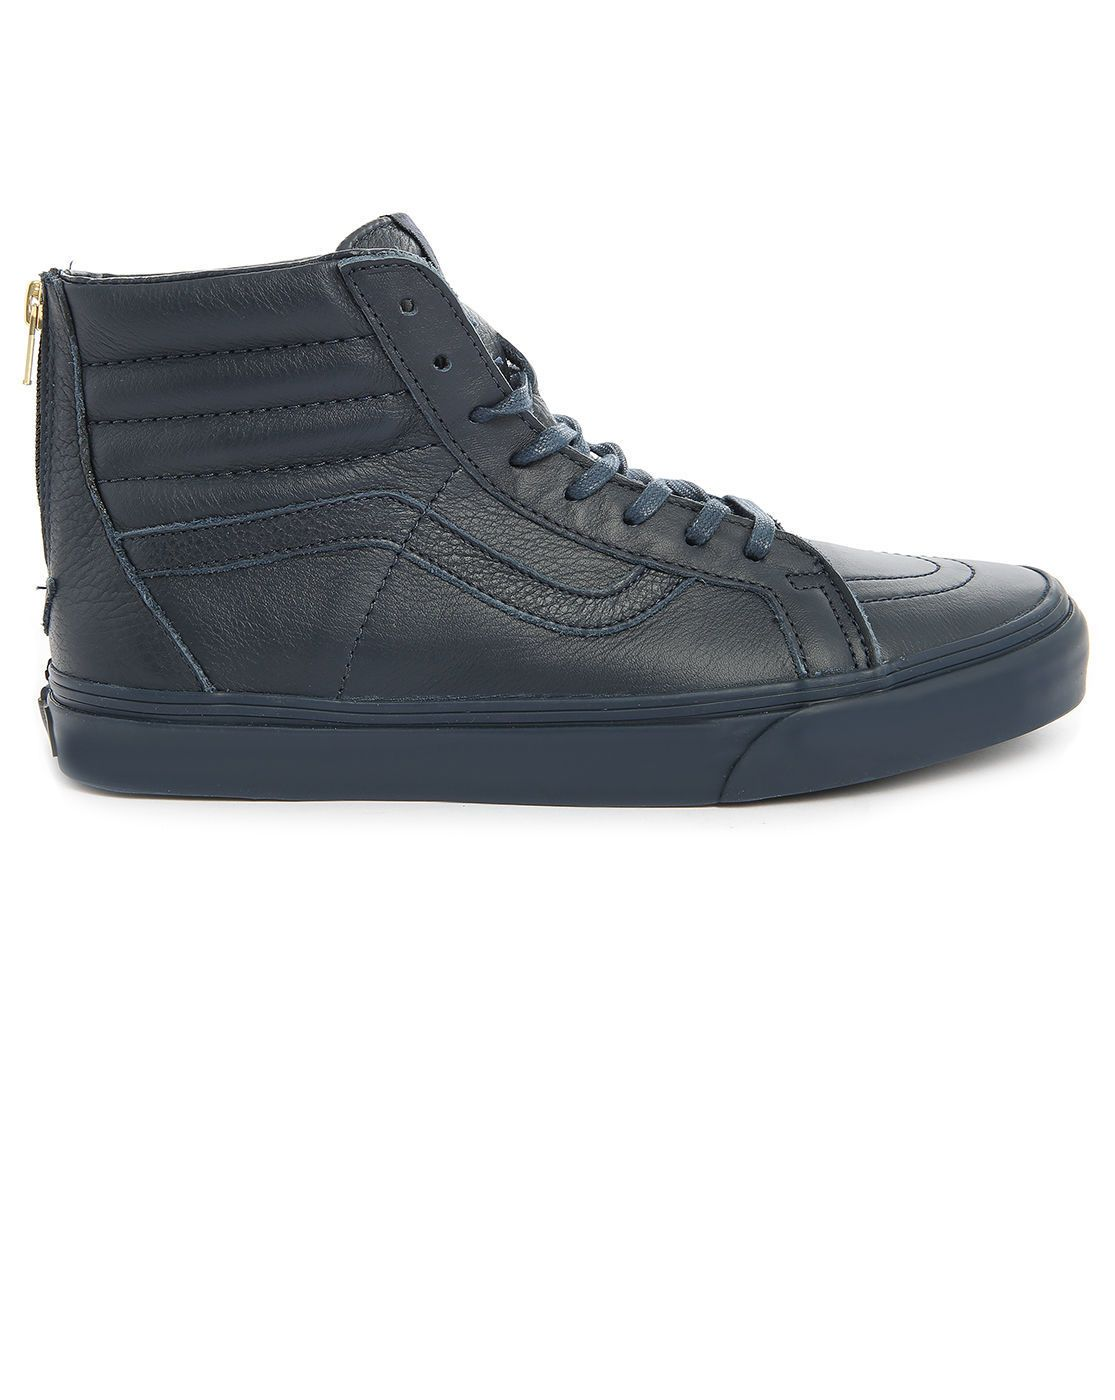 a73c43e86d Vans Sk8 High-Top Navy Leather California Zipper Sneakers in Blue for Men  (navy)